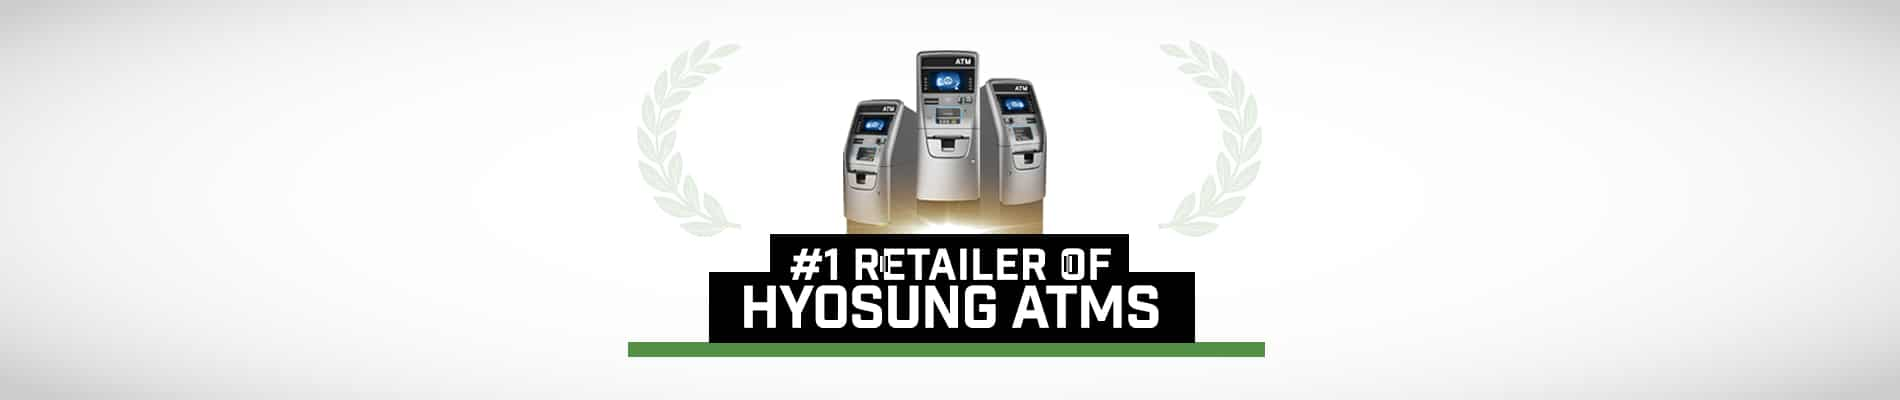 No1-HyosungRetailer-CORDfinancial